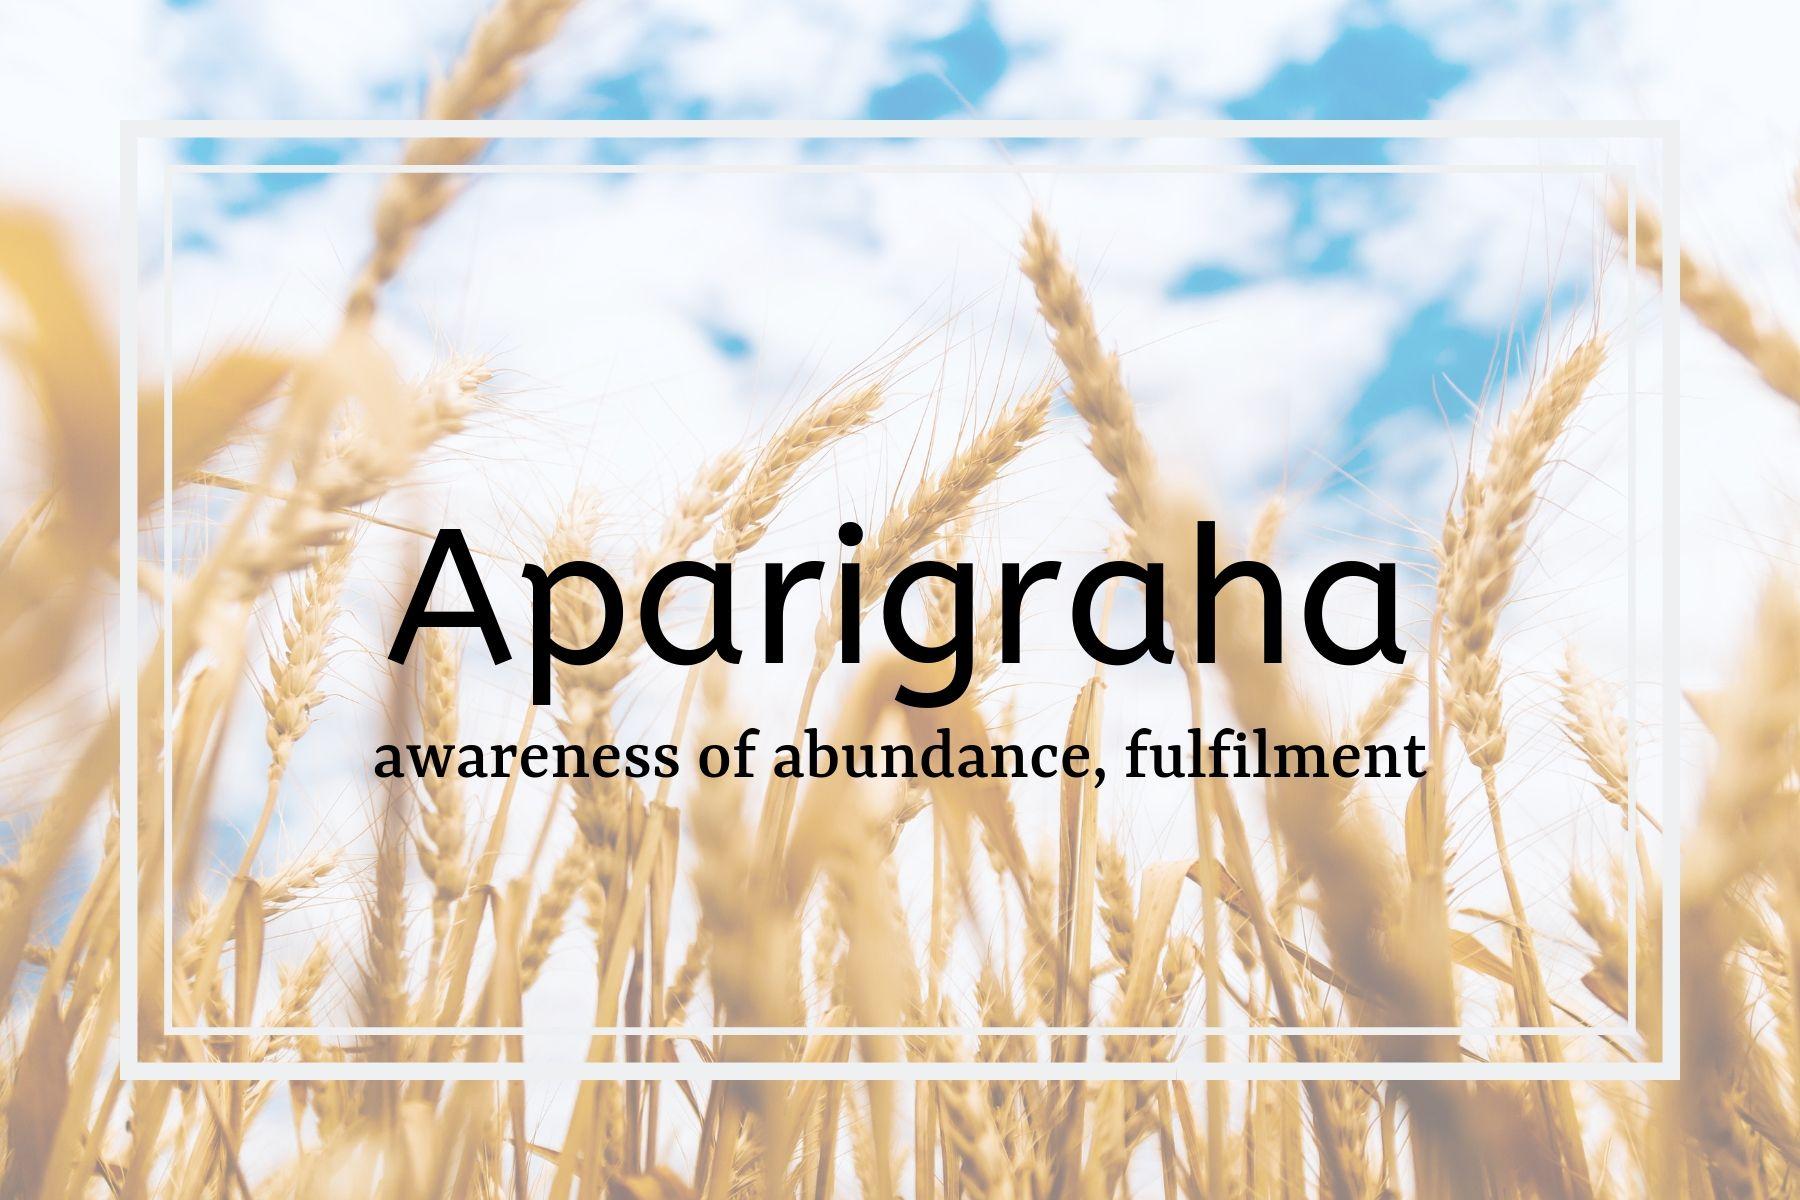 How Yoga & Ayurveda Can Help You Lead a More Sustainable Life - Aparigraha: Awareness of Abundance & Fulfilment